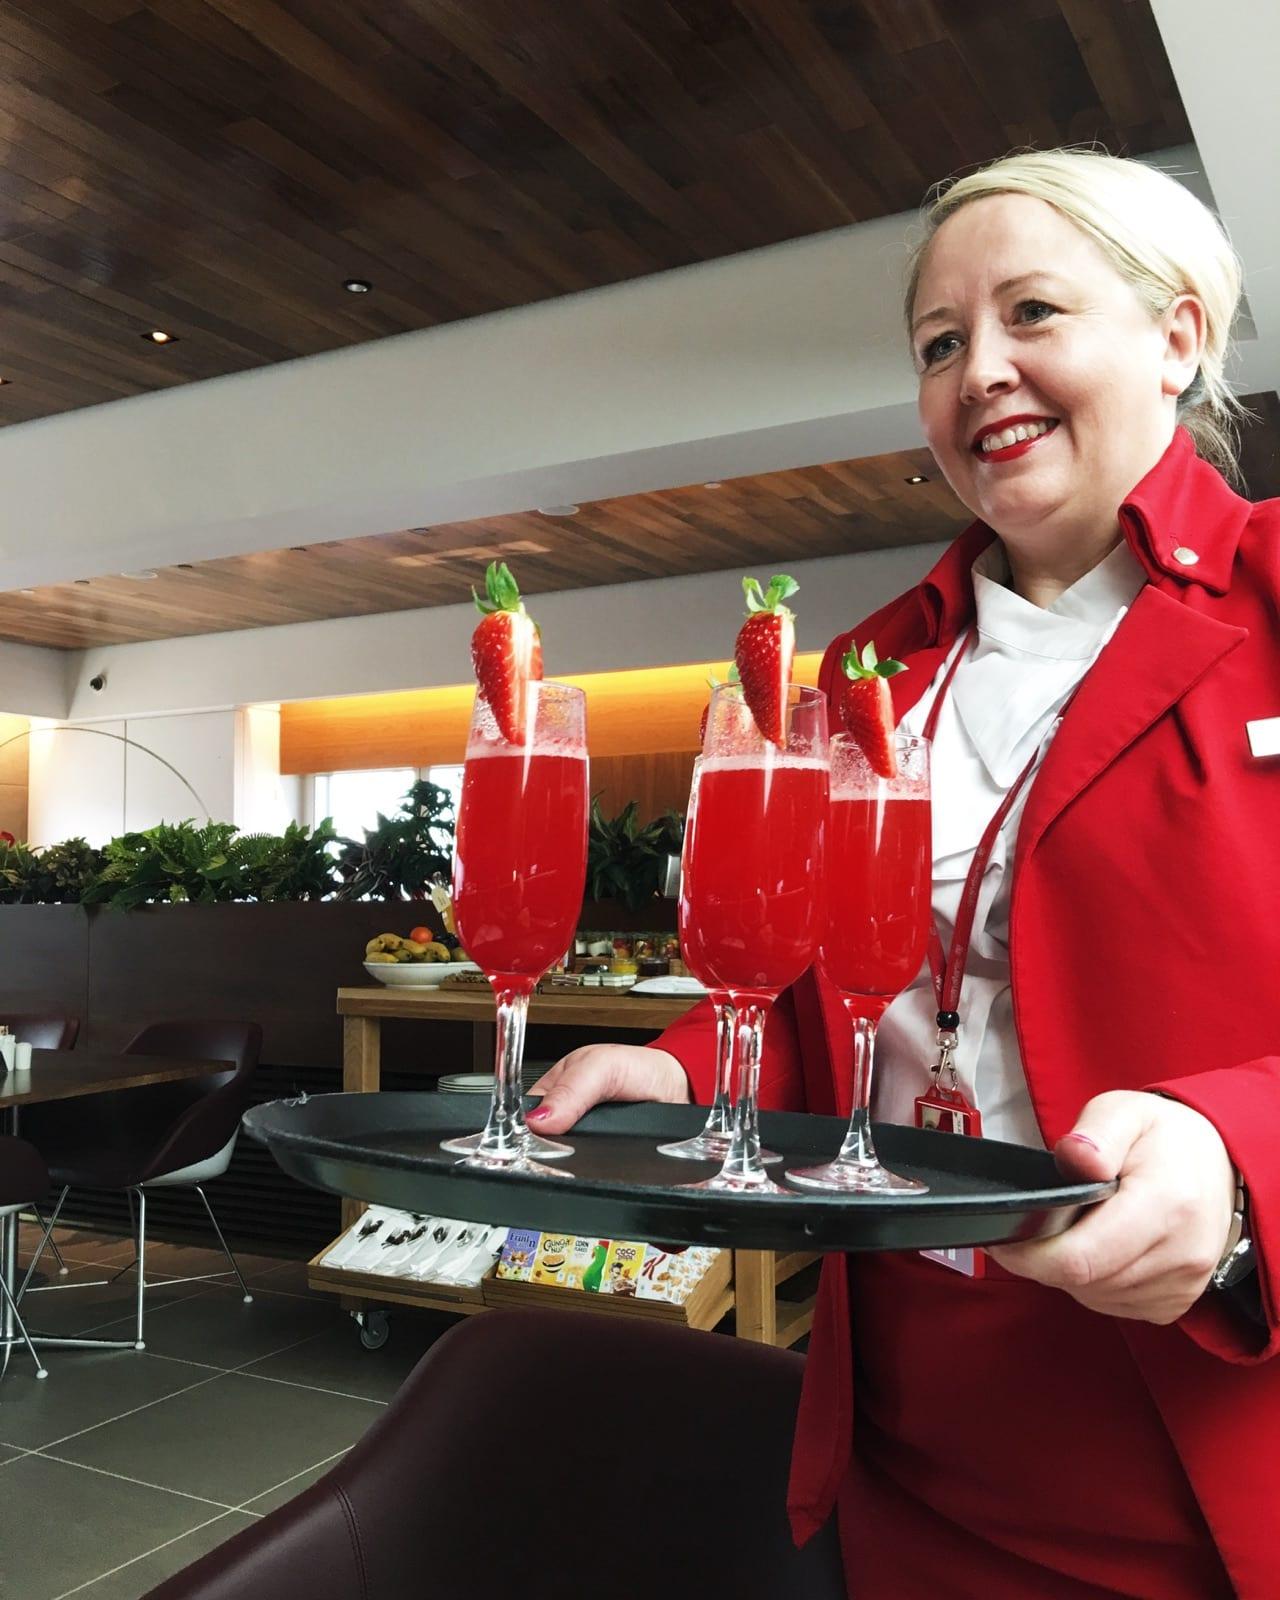 Virgin Atlantic Clubhouse Heathrow- Seattle to London- BloggerNotBillionaire.com